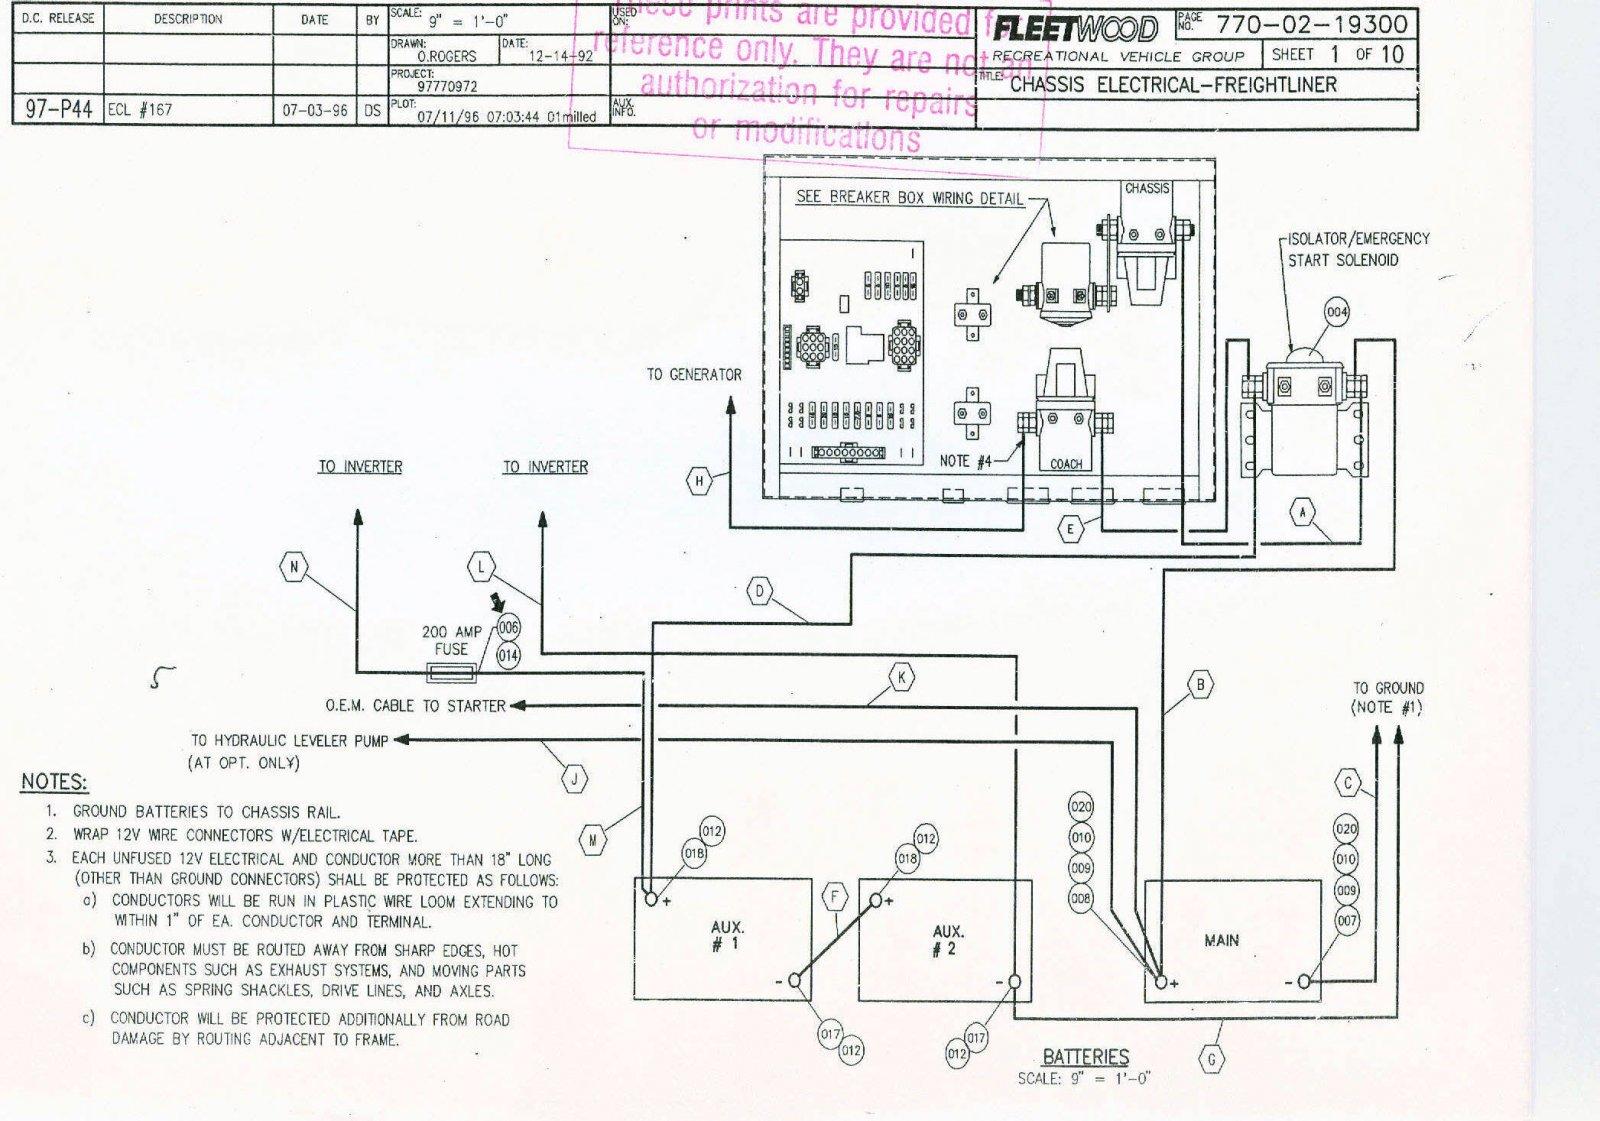 Slide Out Switch Wiring Diagram P Rails Keysstone 1985 Yamaha Maxim Xj700 Chevrolet Tracker Ignition Motorhomes On Slides Auto